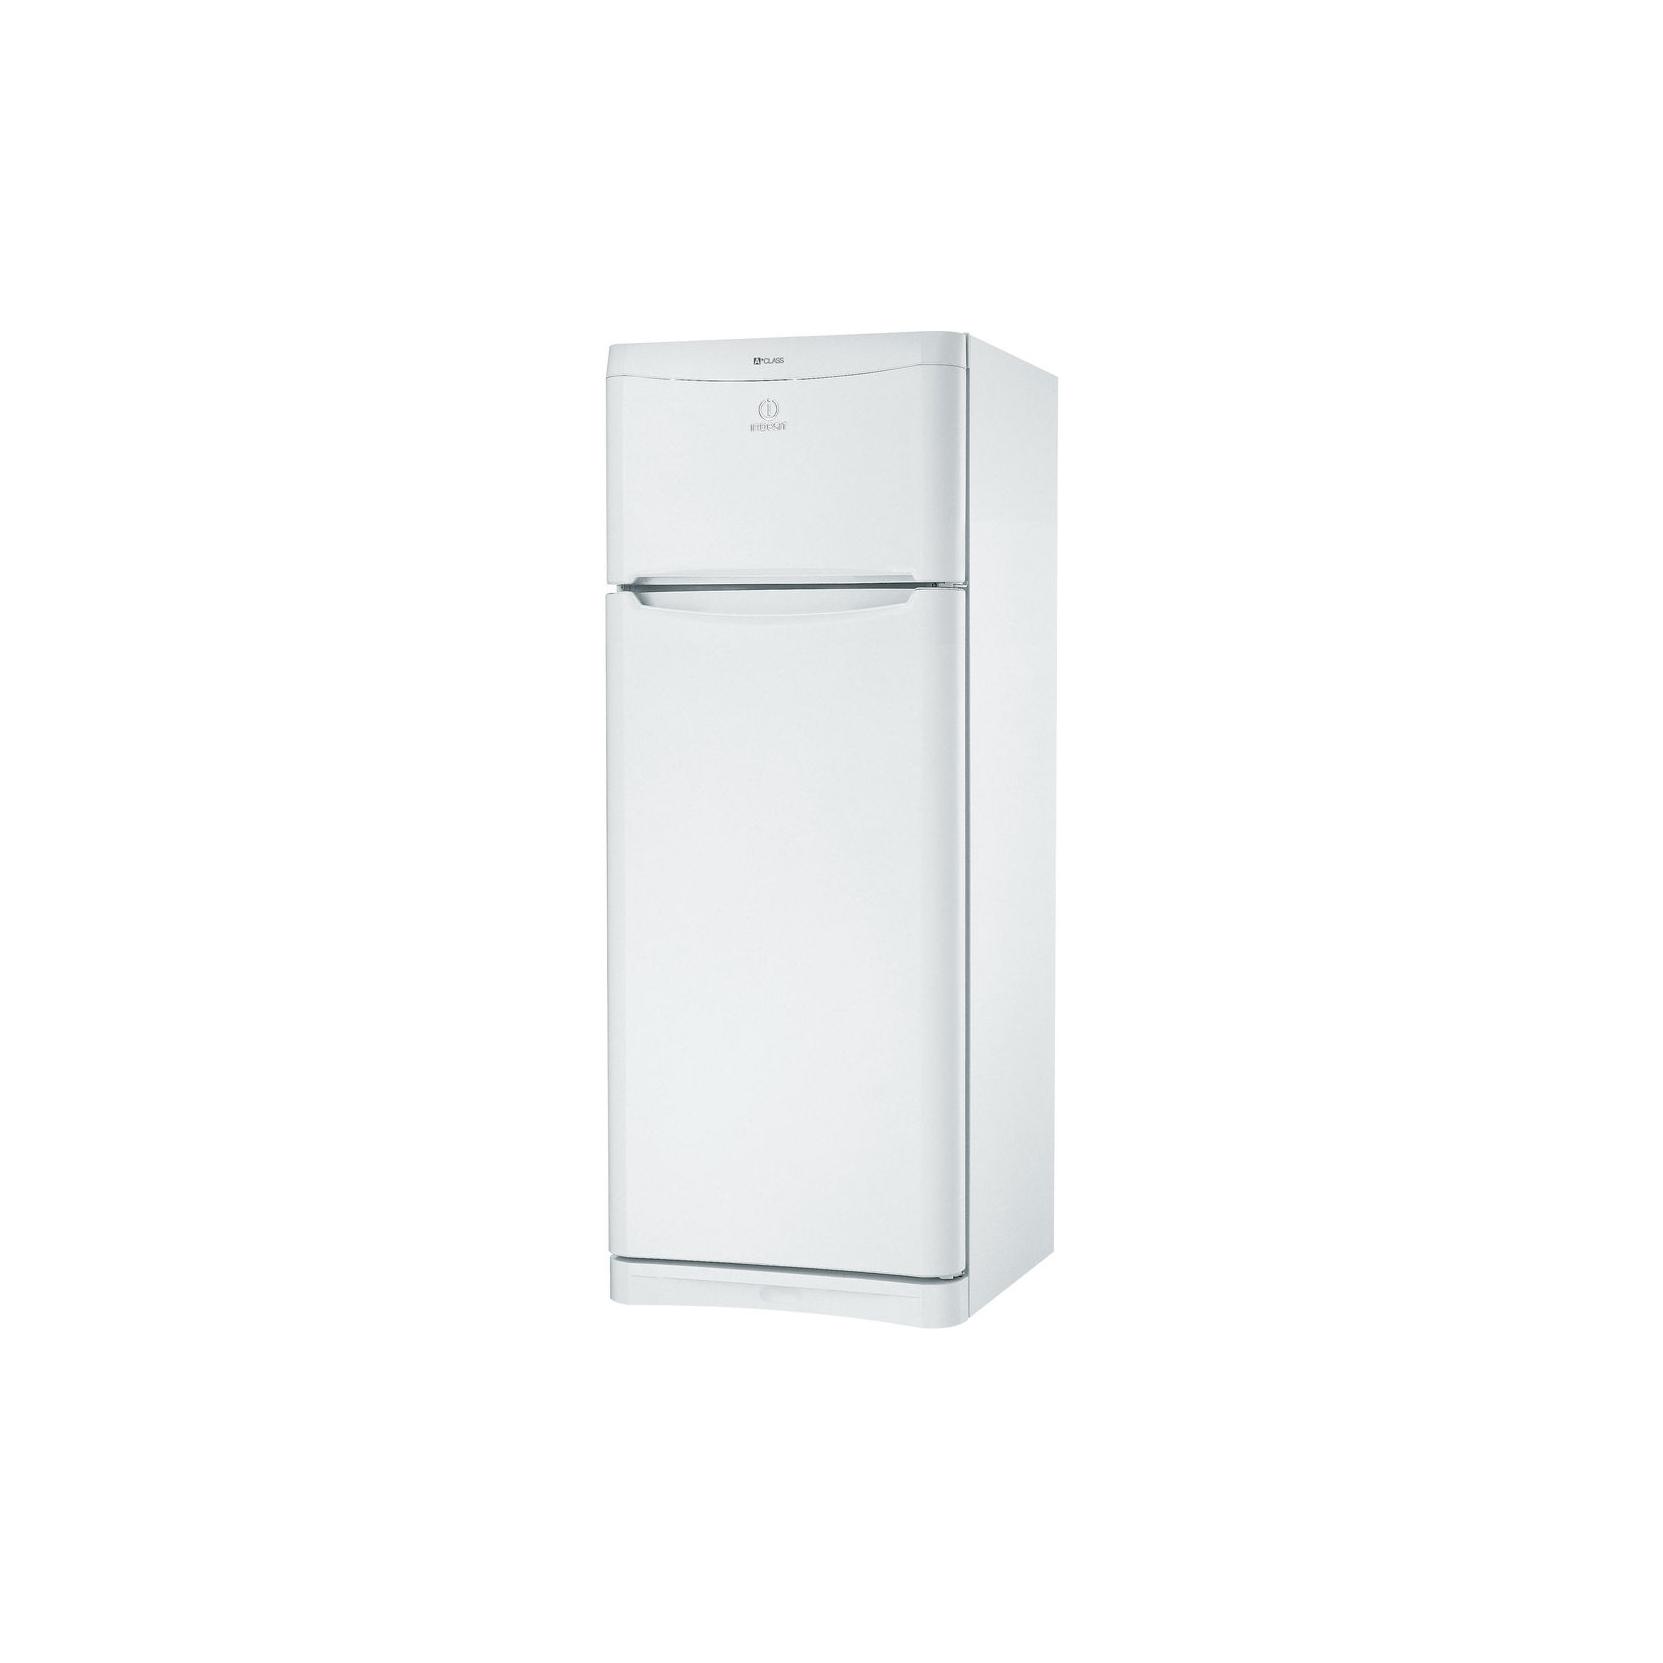 frigorifero doppia porta indesit teaa5p 435lt a 70cm. Black Bedroom Furniture Sets. Home Design Ideas